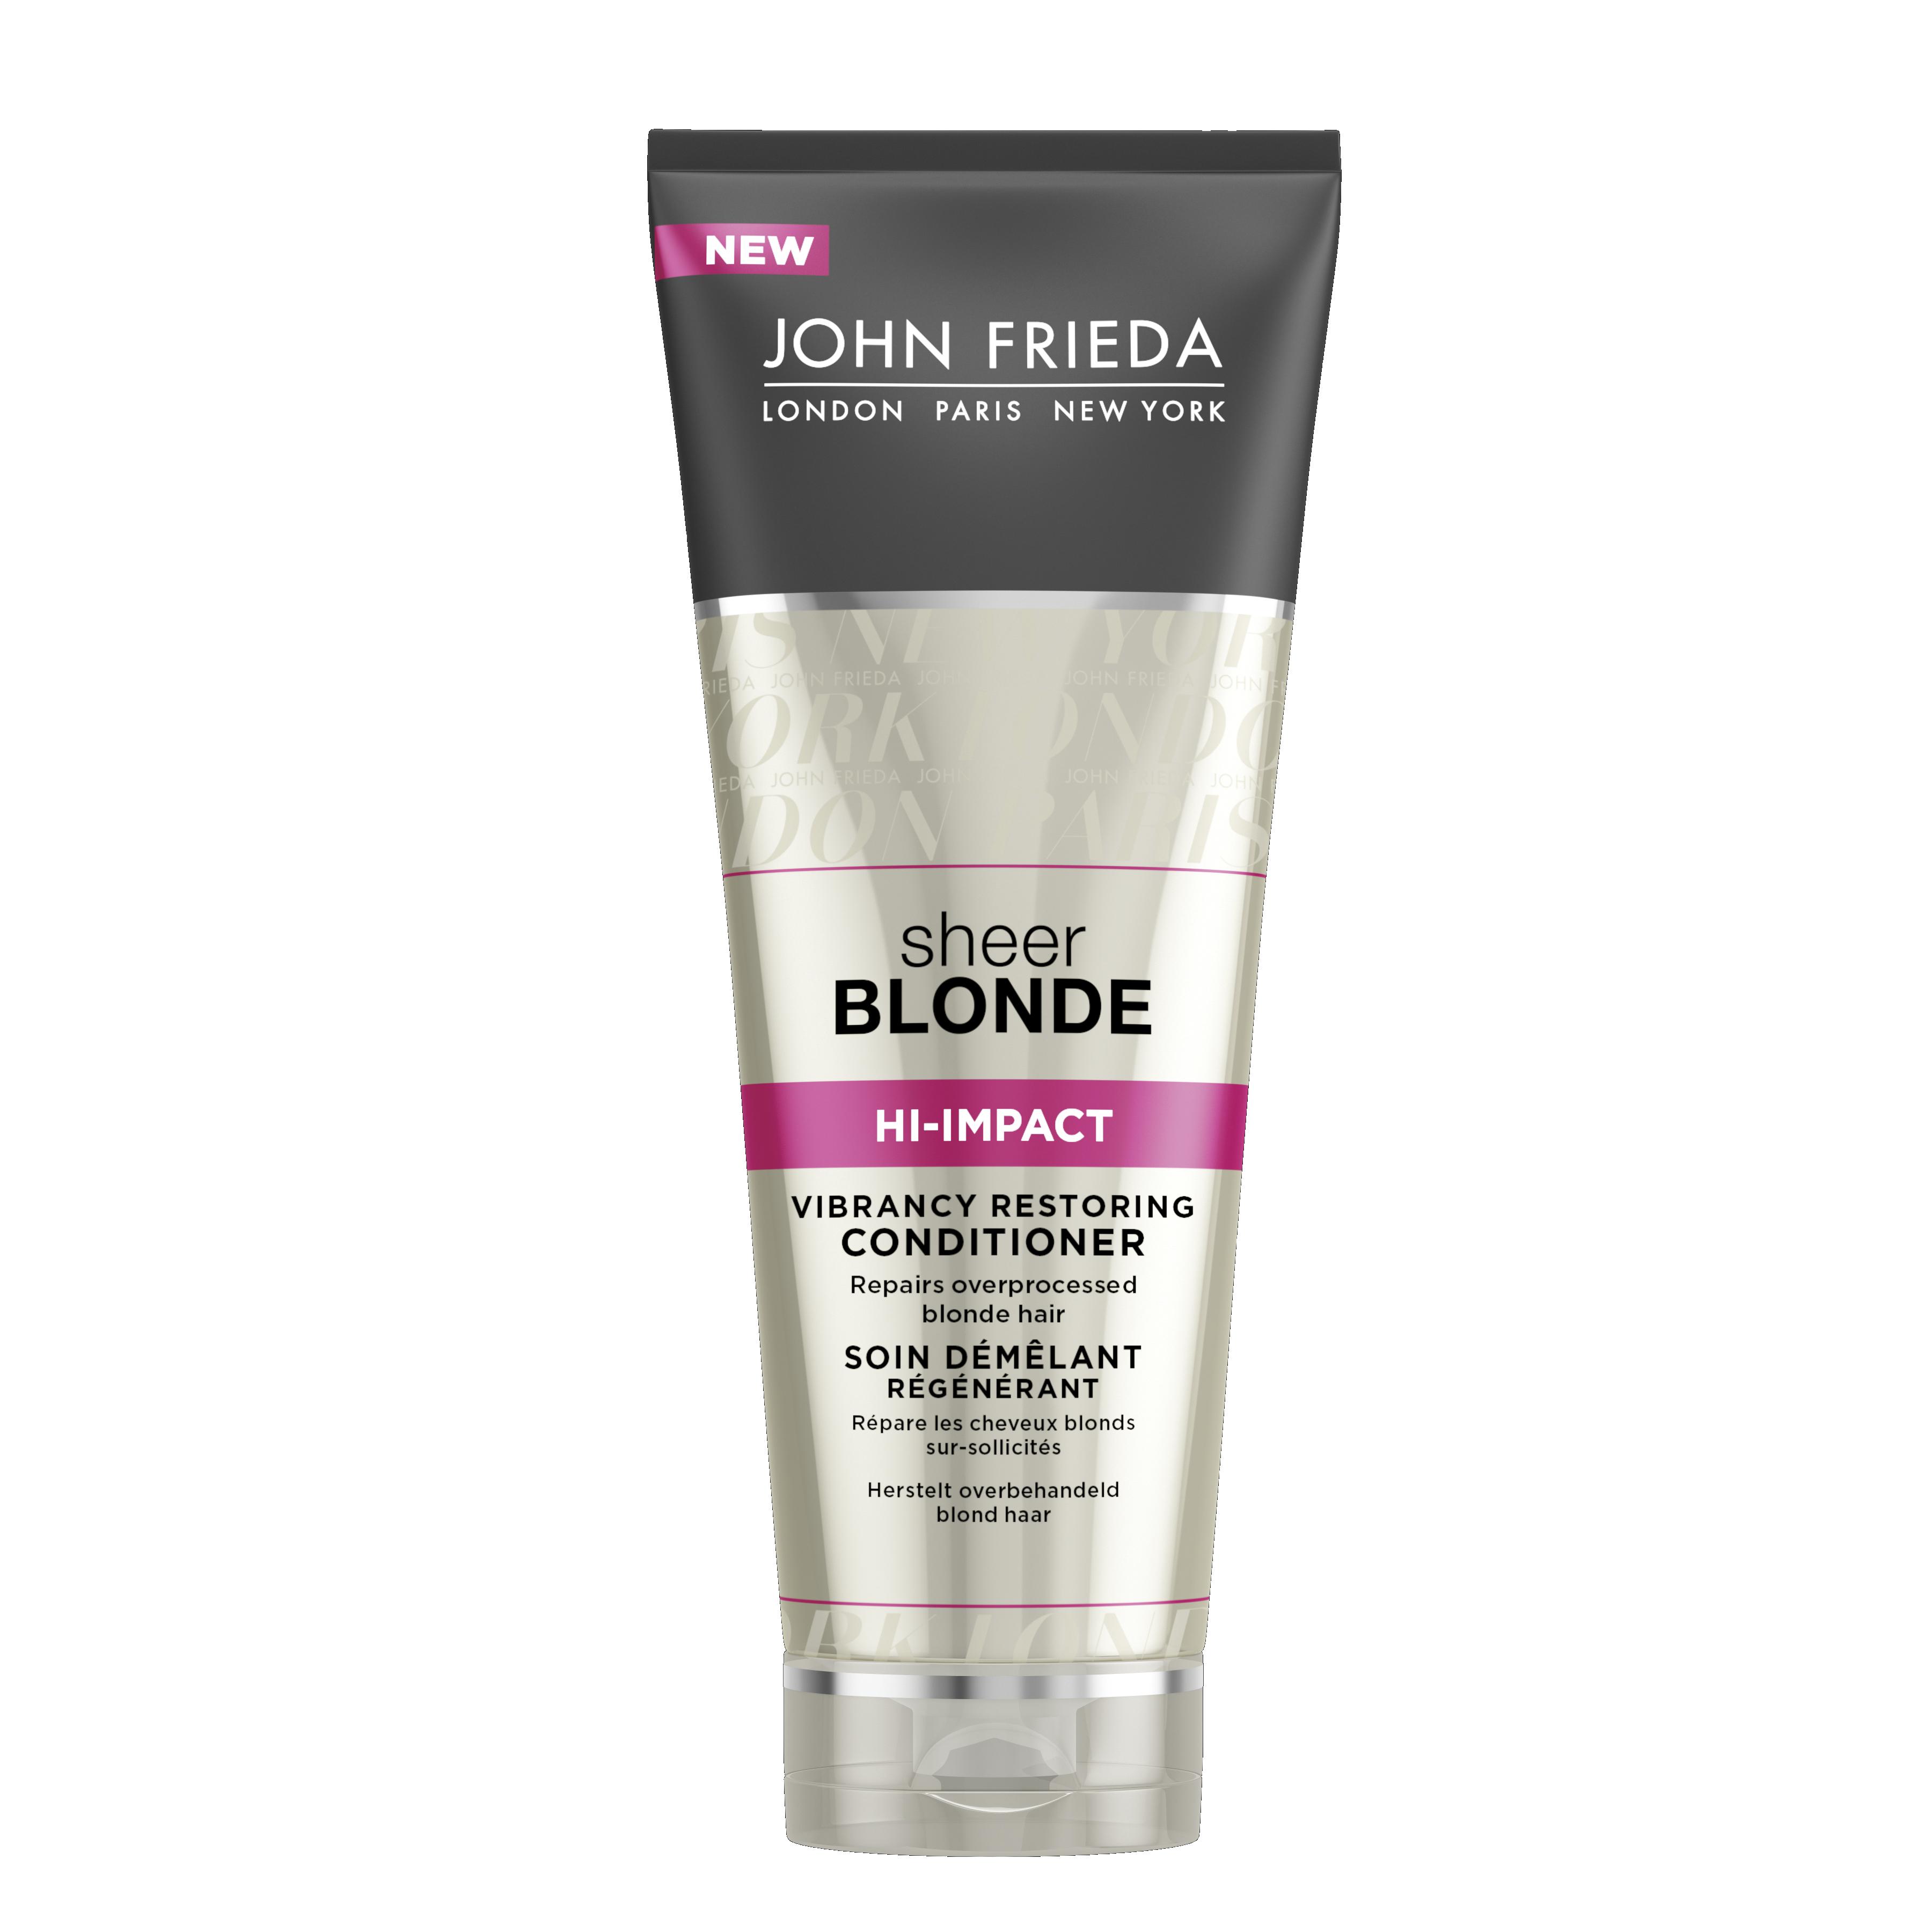 Sheer Blonde Hi-Impact Condtioner 250ml